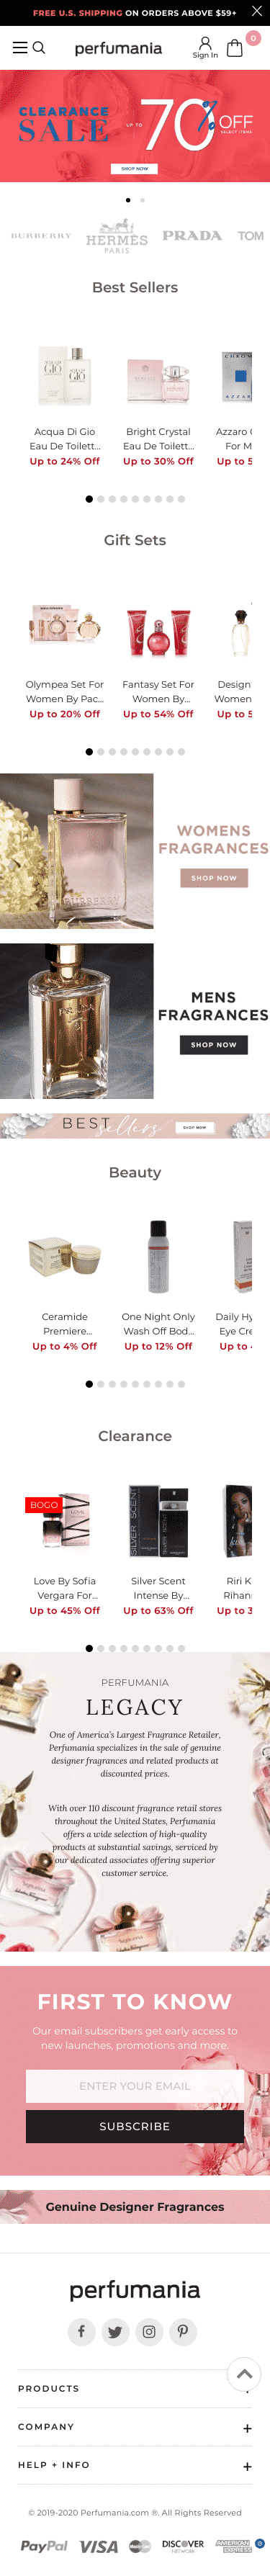 Perfumania.com Coupon